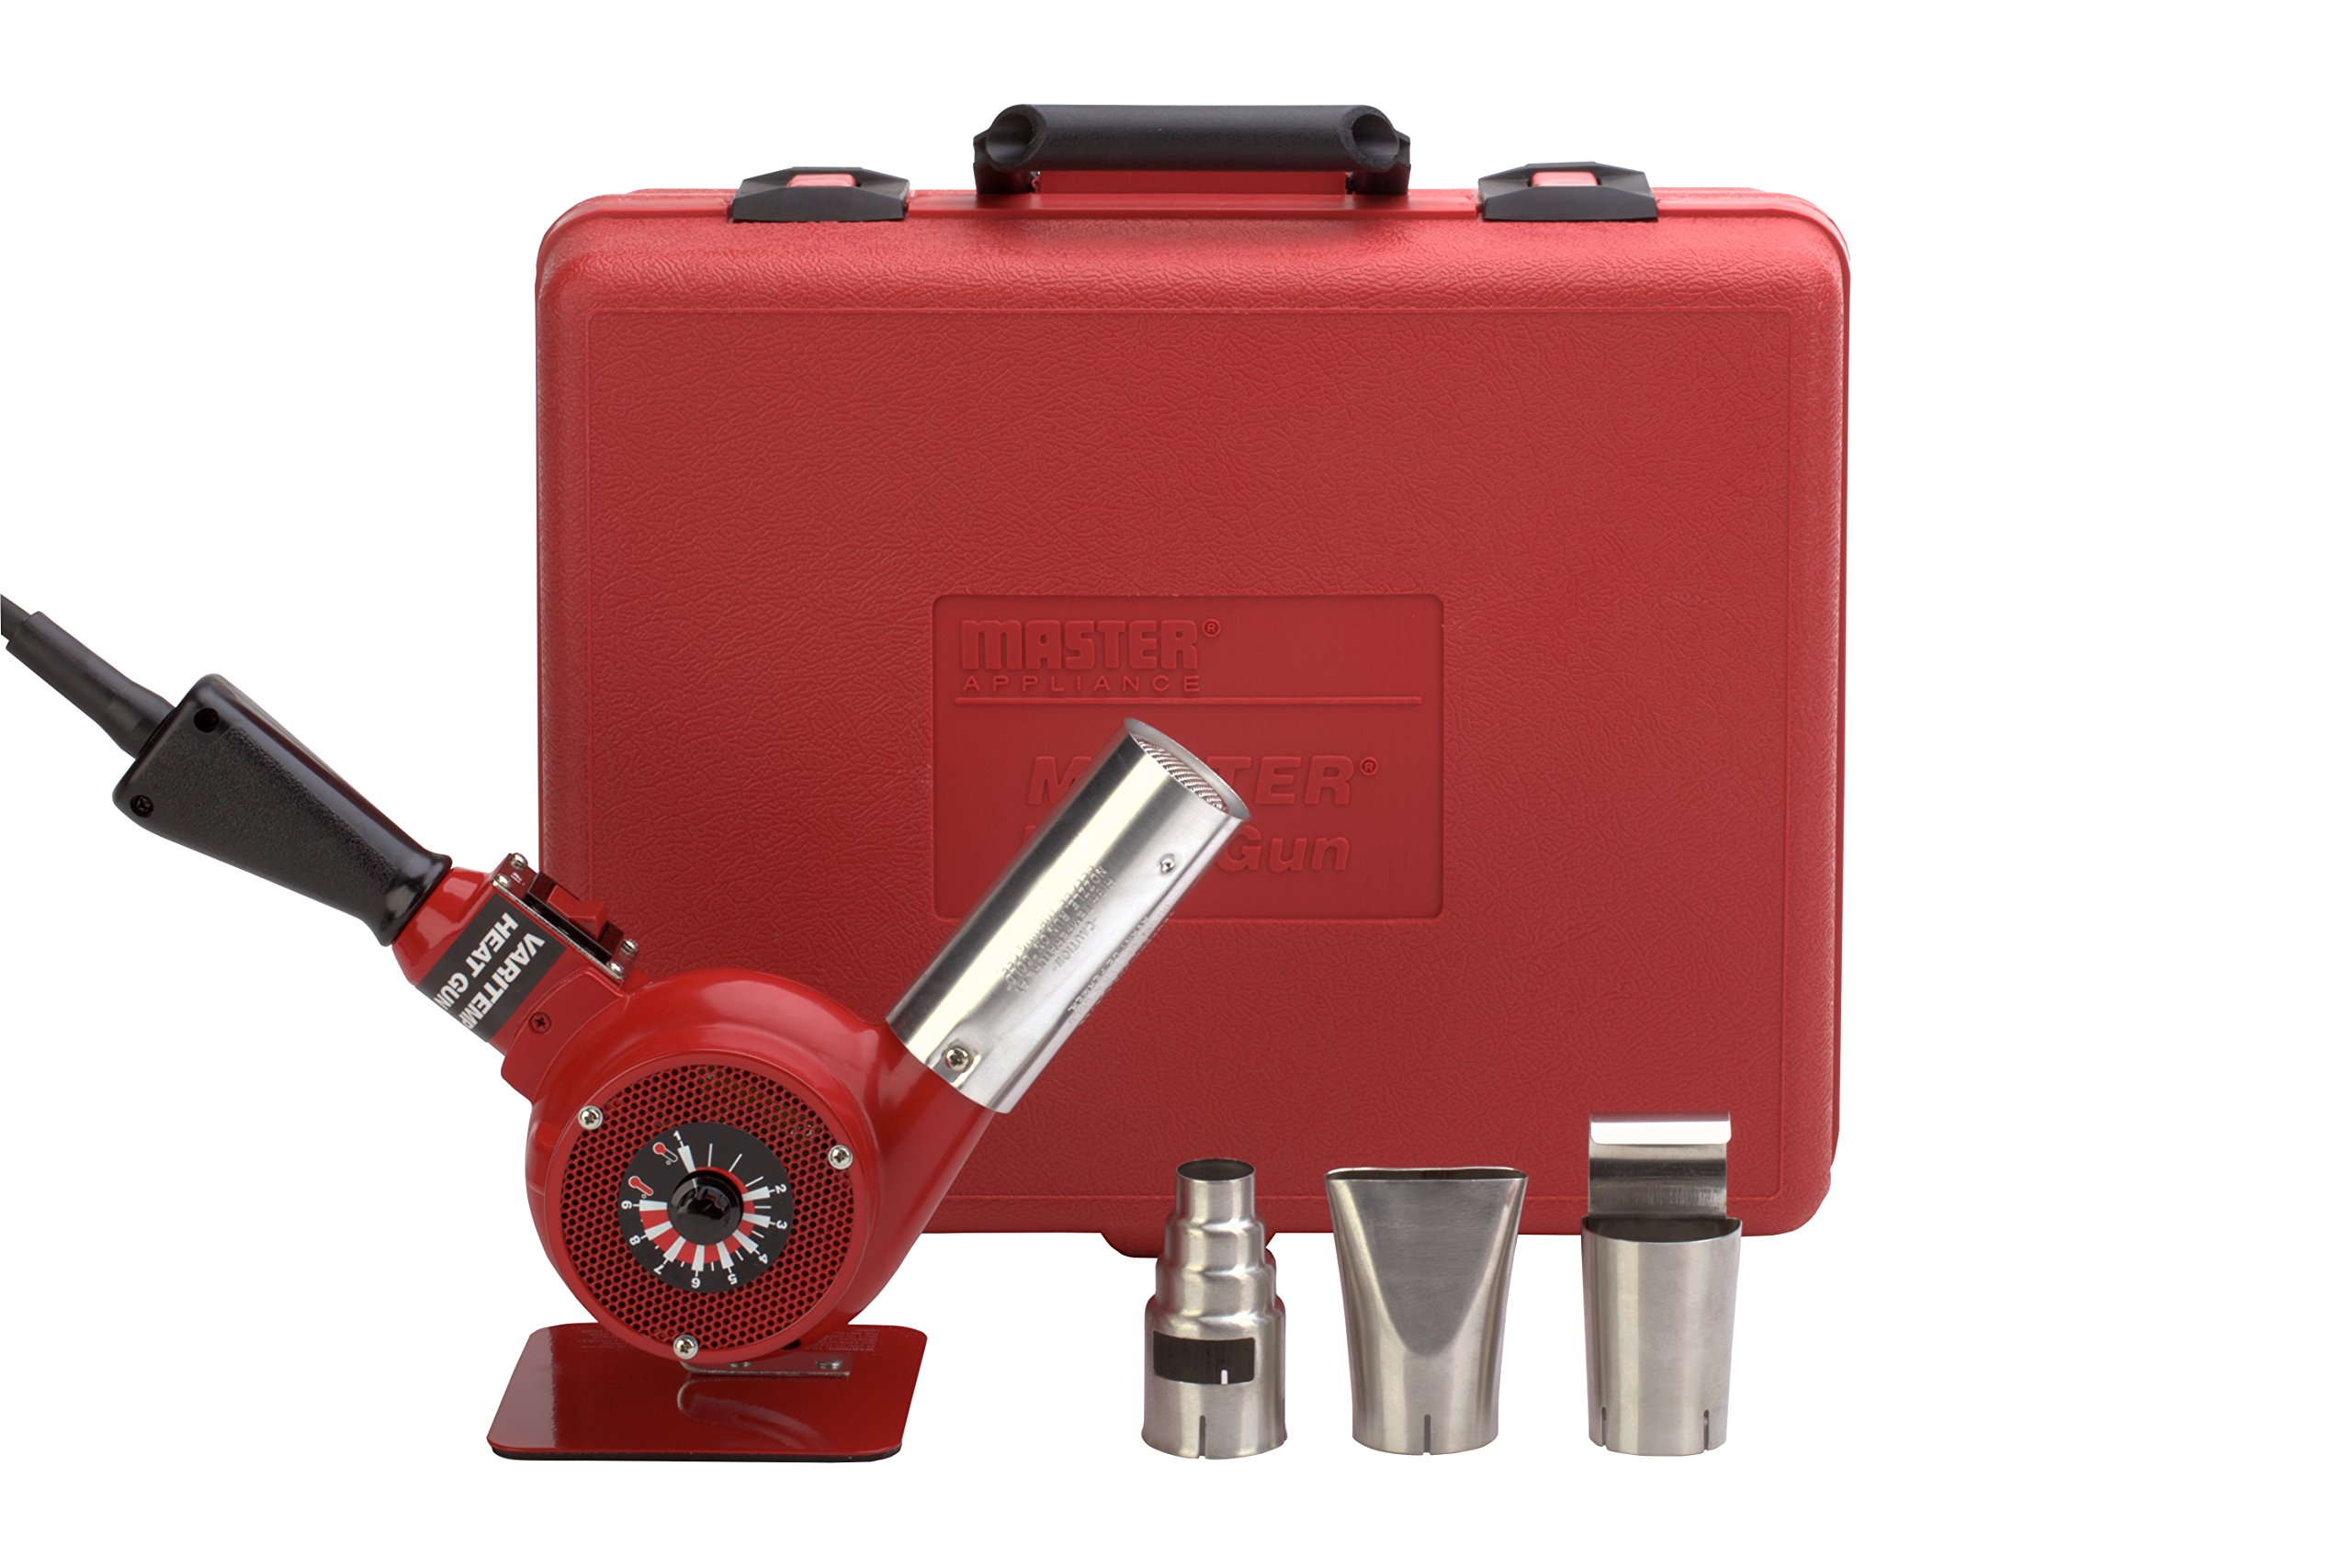 Master Appliance Varitemp Heat Gun Kit, 1000-Degree Fahrenheit 120V 1740 Watts